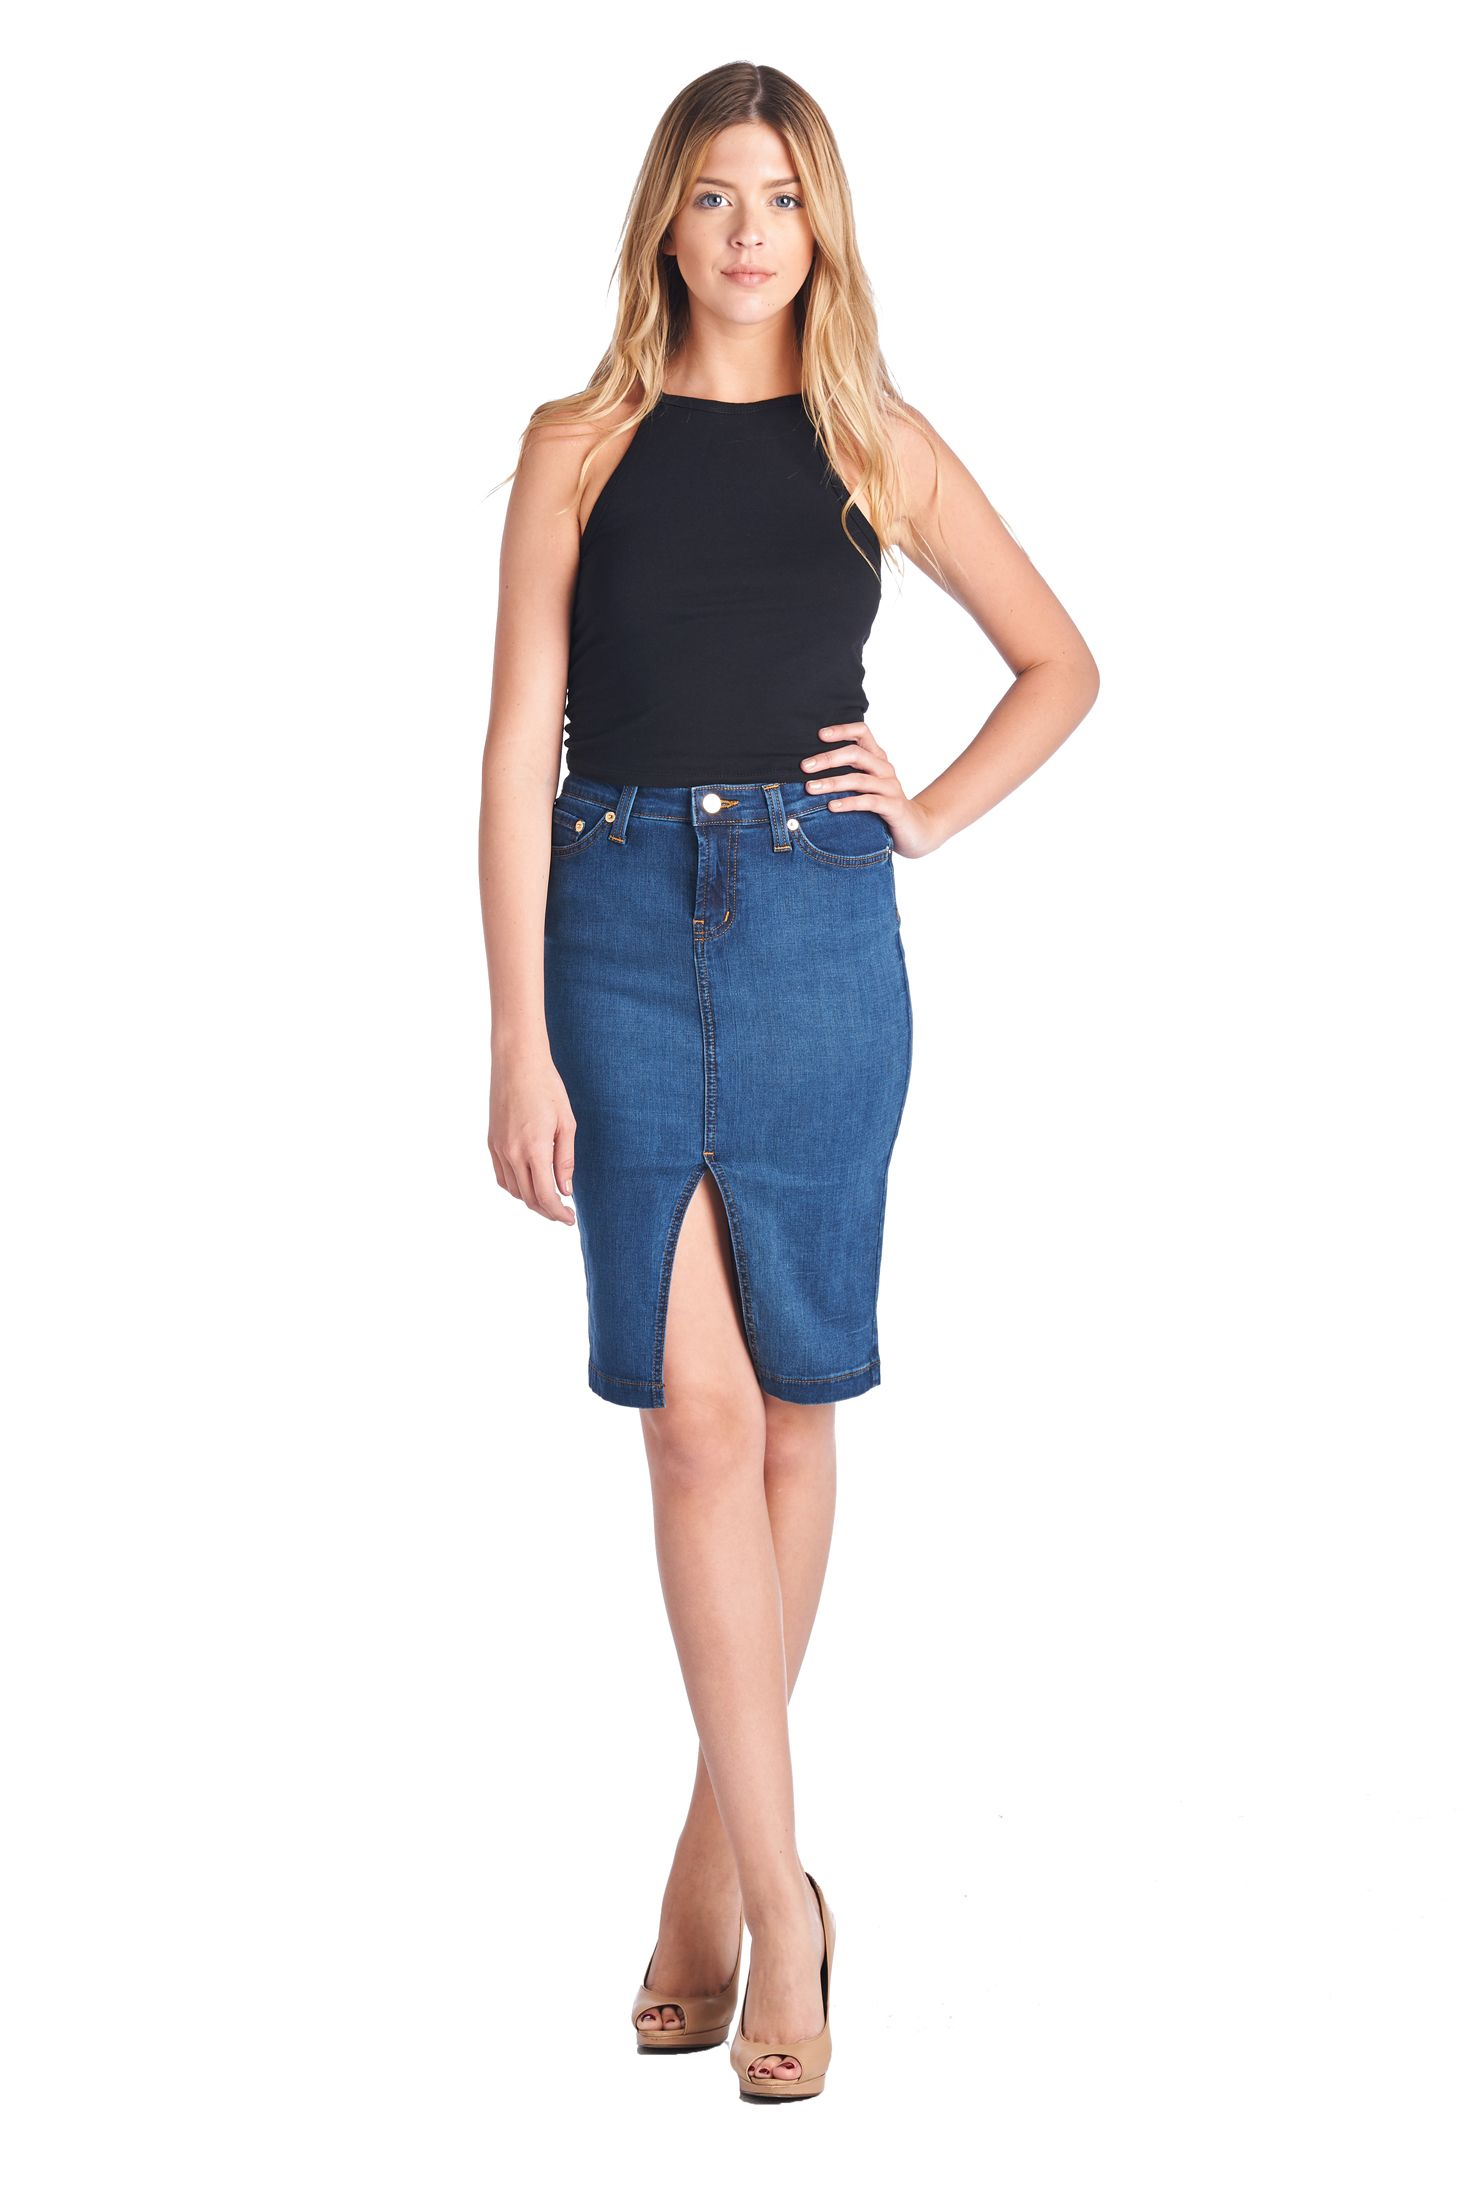 Parkers Jeans - Mid Length Slit Denim Skirt  #denim #jeans #skirt #premium #slit #spring #trends #fashion #lookbook #parkersjeans